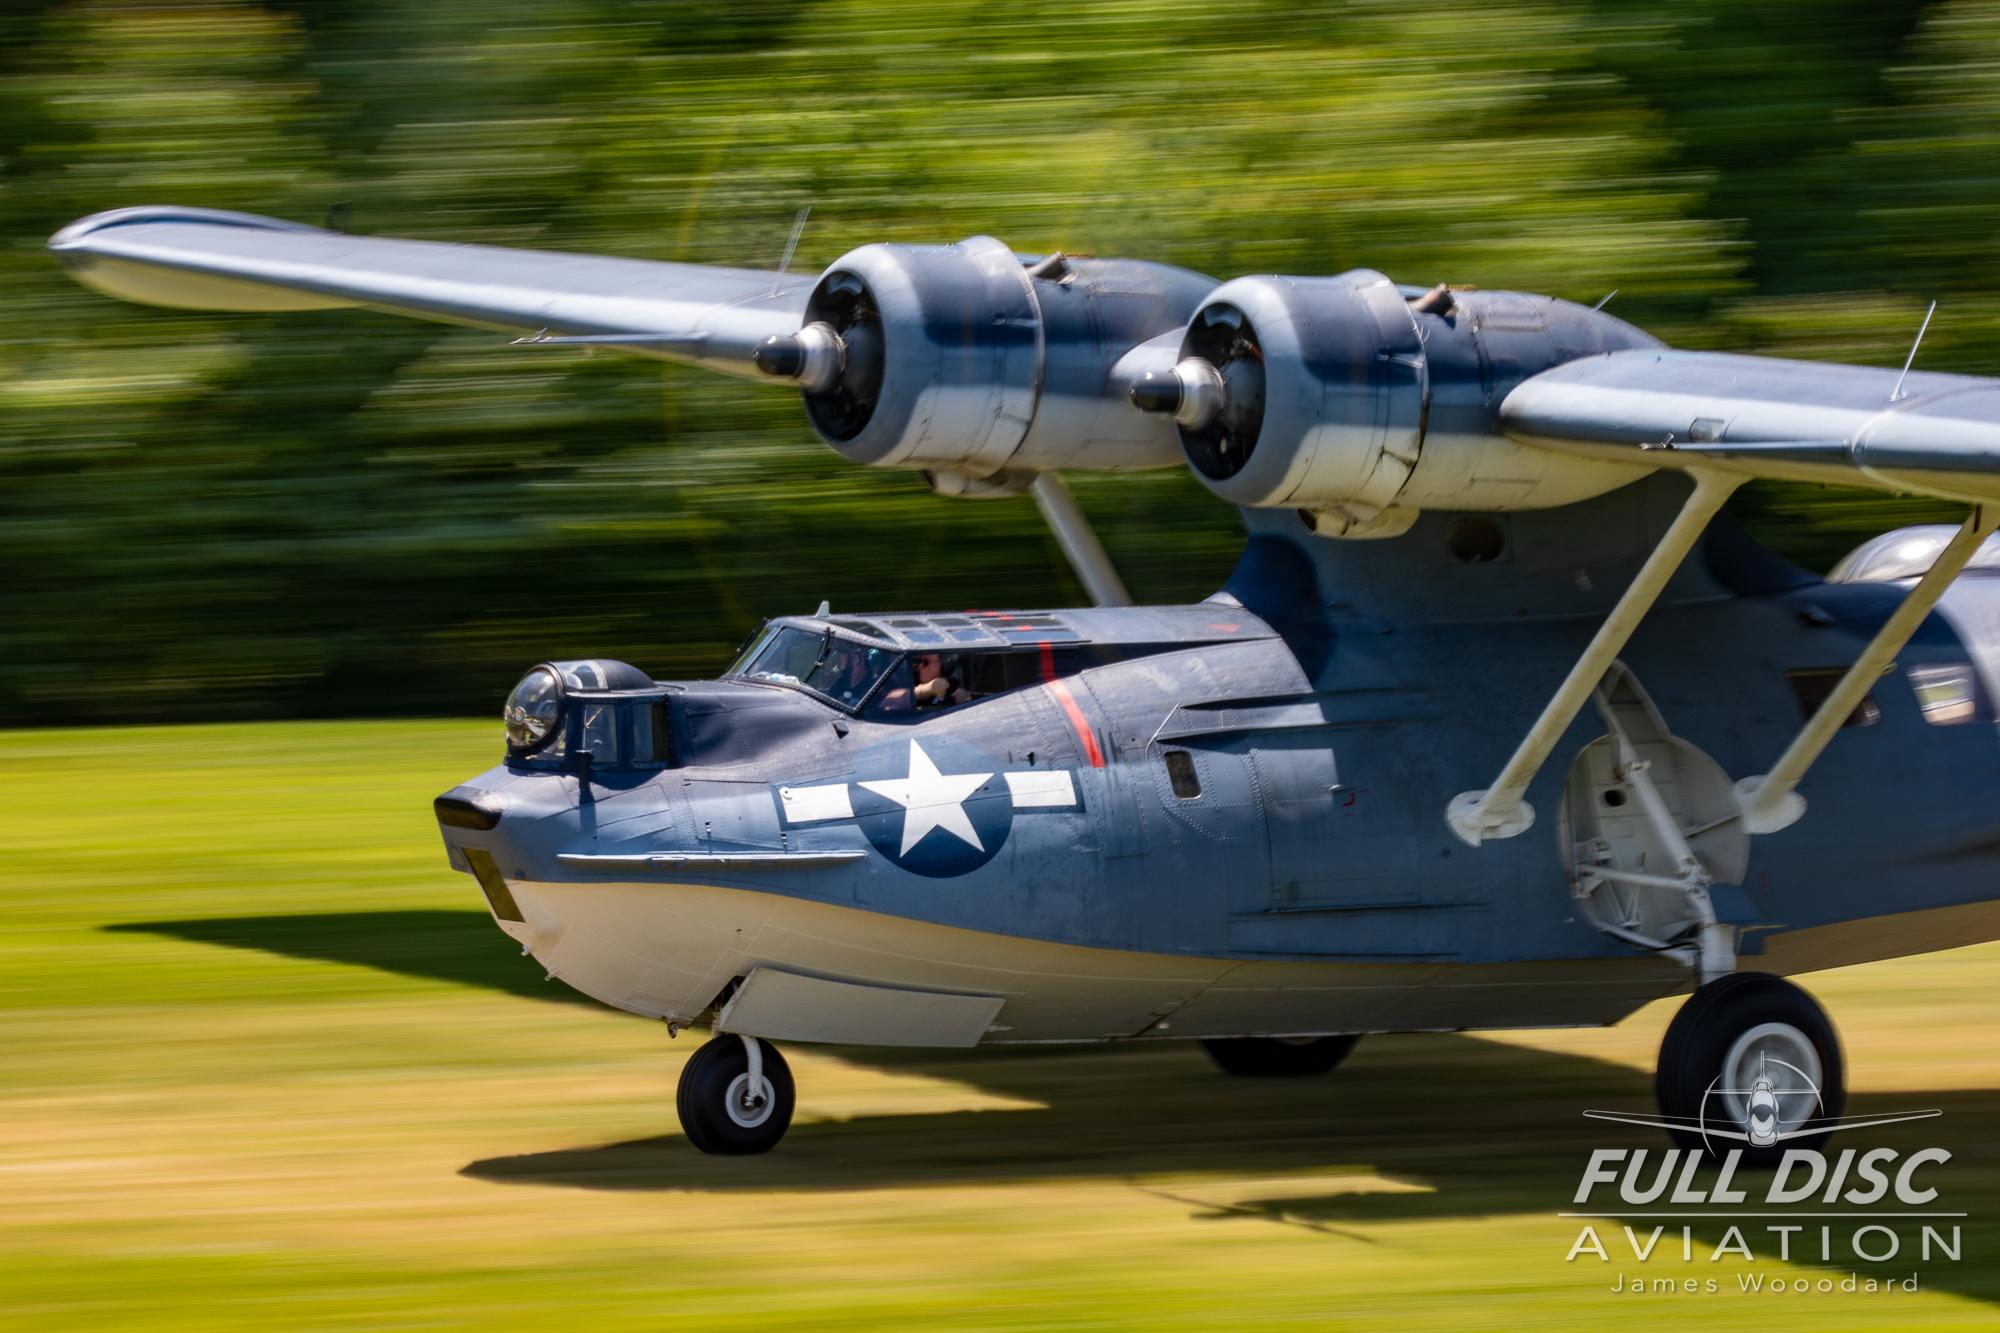 WarbirdsOverTheBeach_FullDiscAviation_JamesWoodard-May 18, 2019-05.jpg